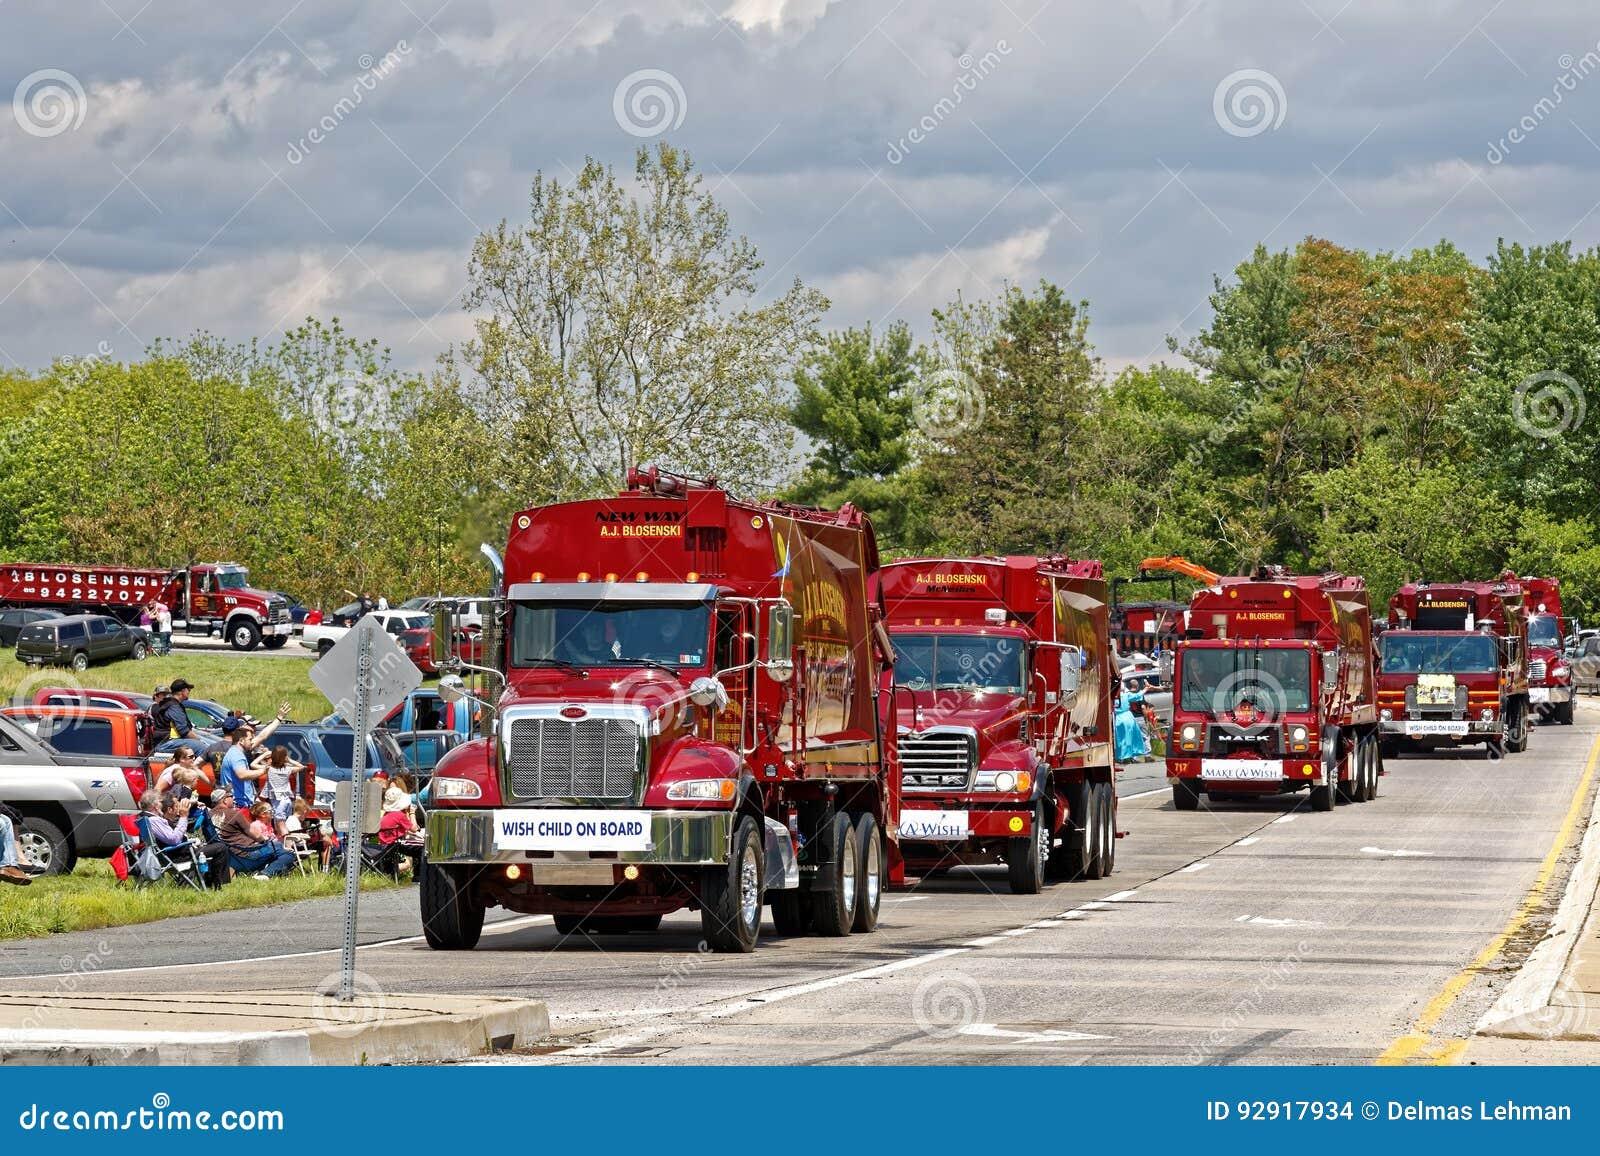 Courtesy Lincoln Lafayette La >> Lancaster County Department Of Motor Vehicles - impremedia.net